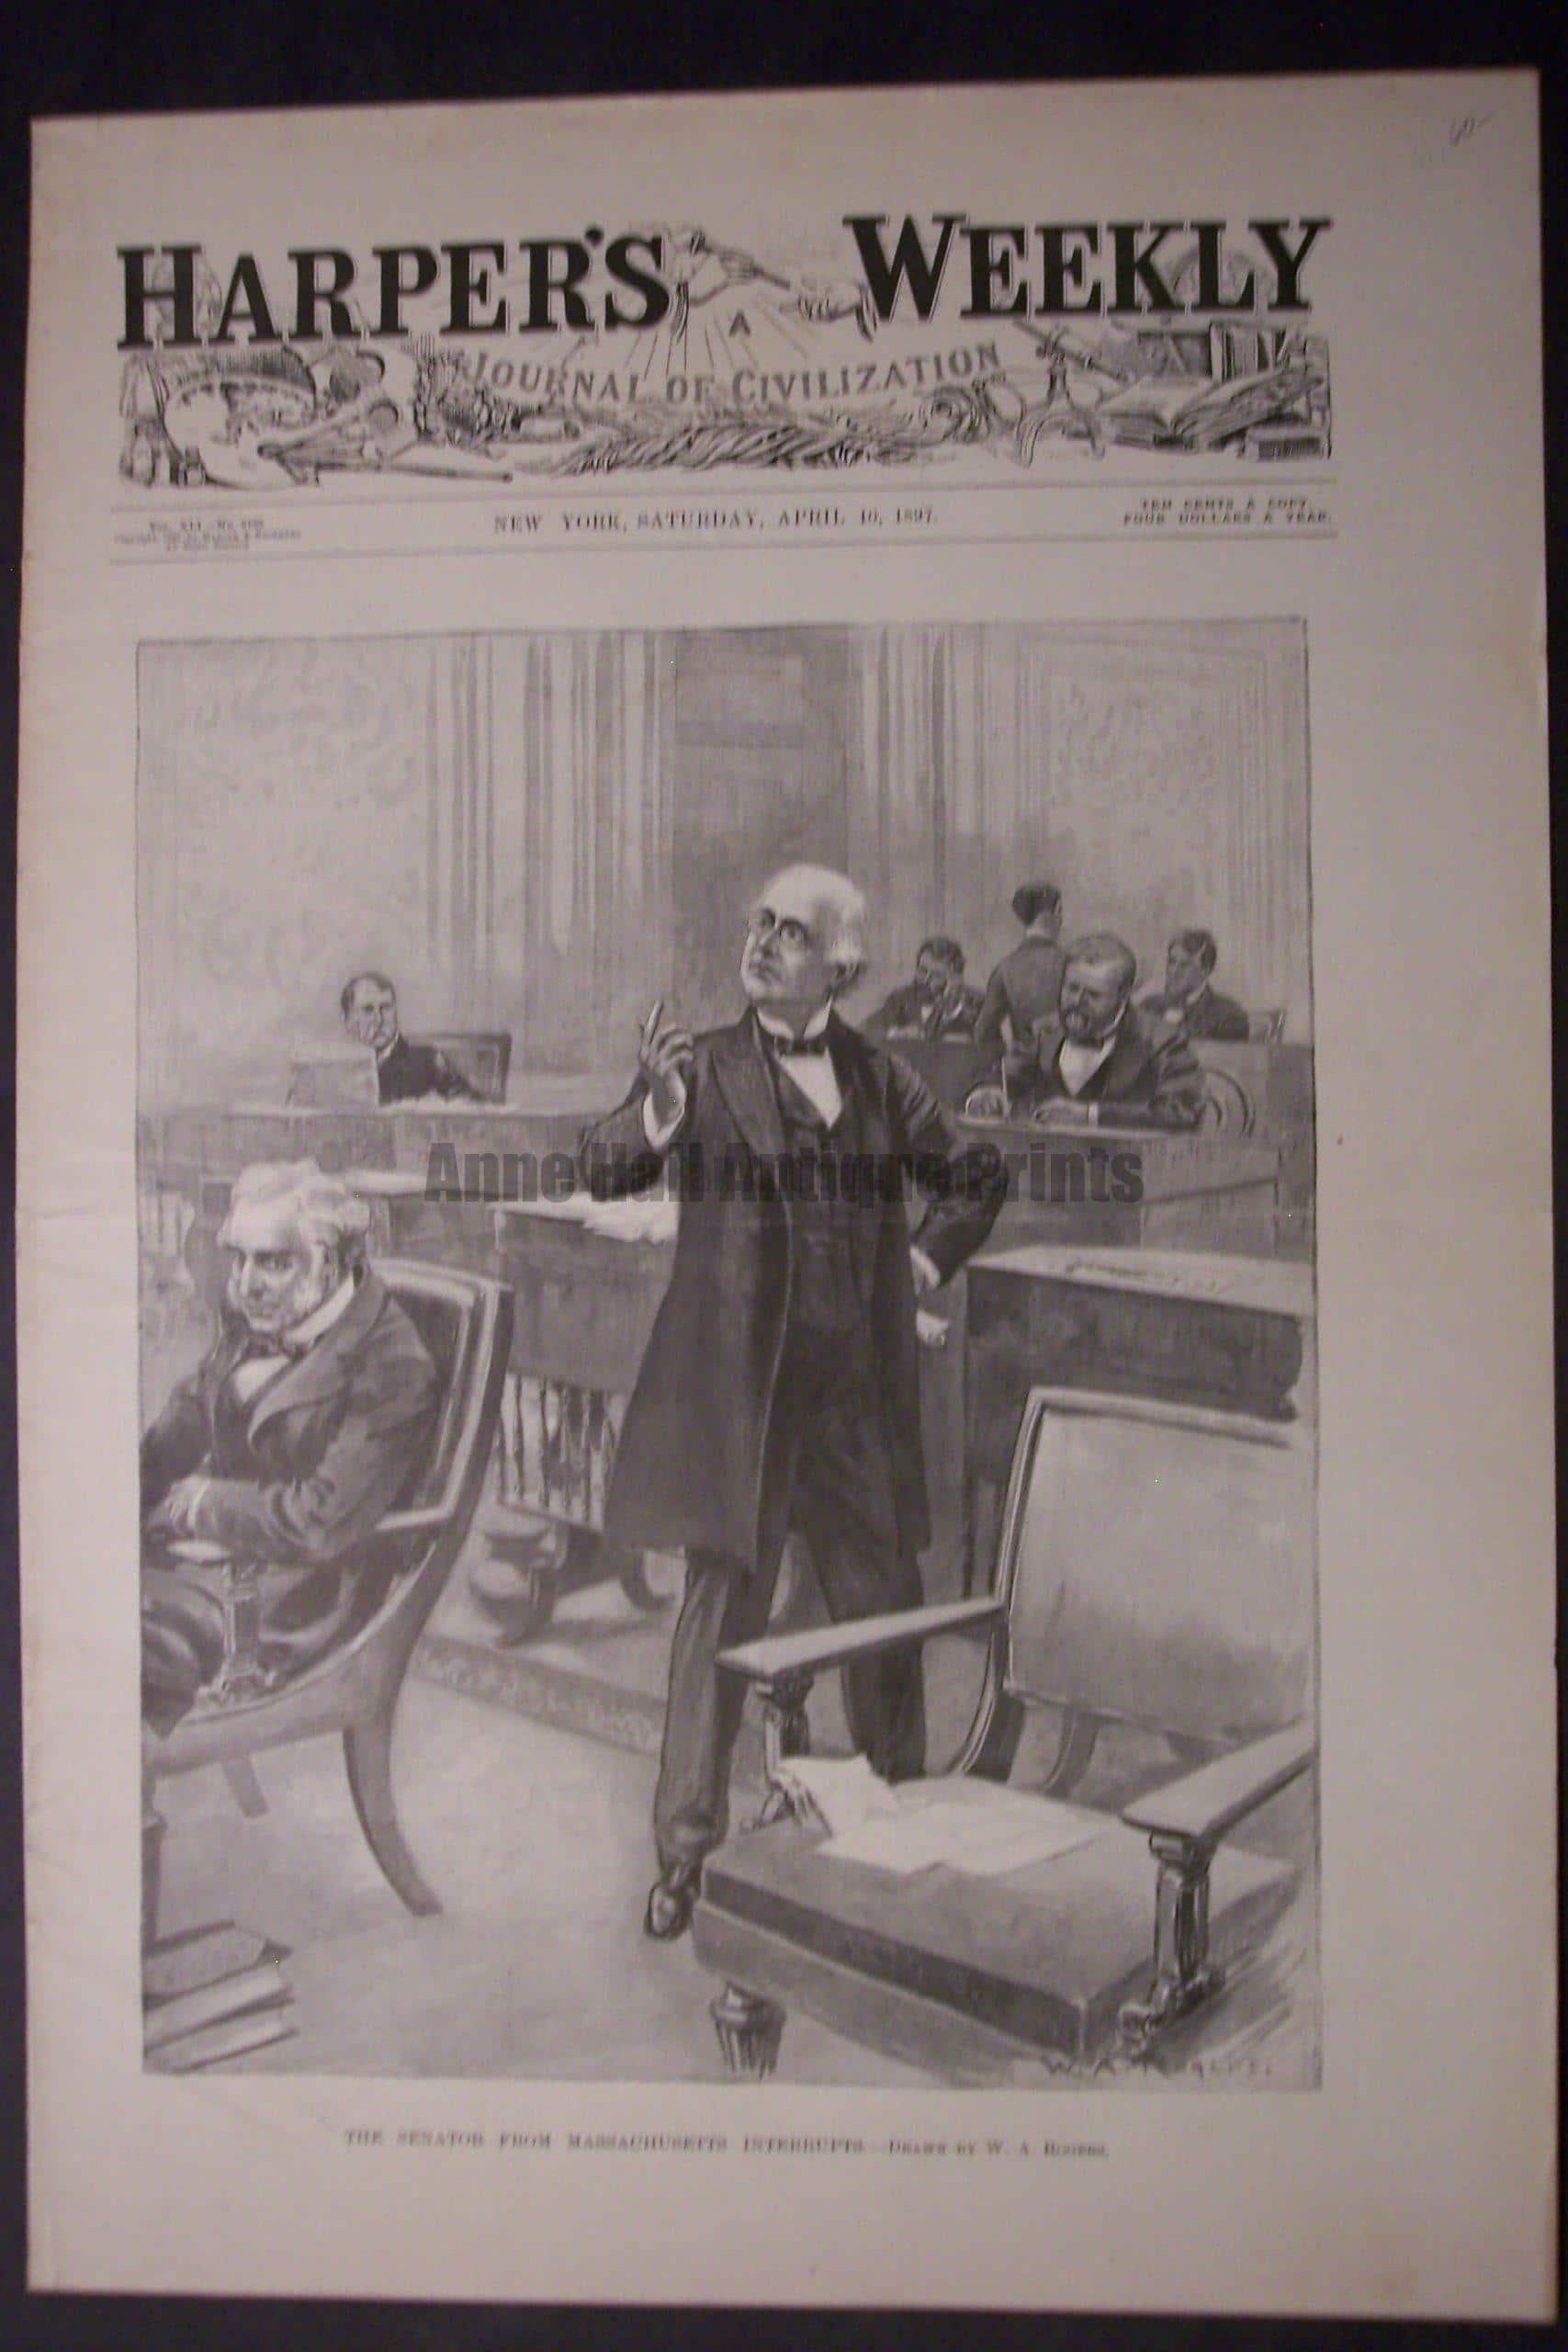 The Senator from Massachusetts Interrupts, April 10, 1897. $60.